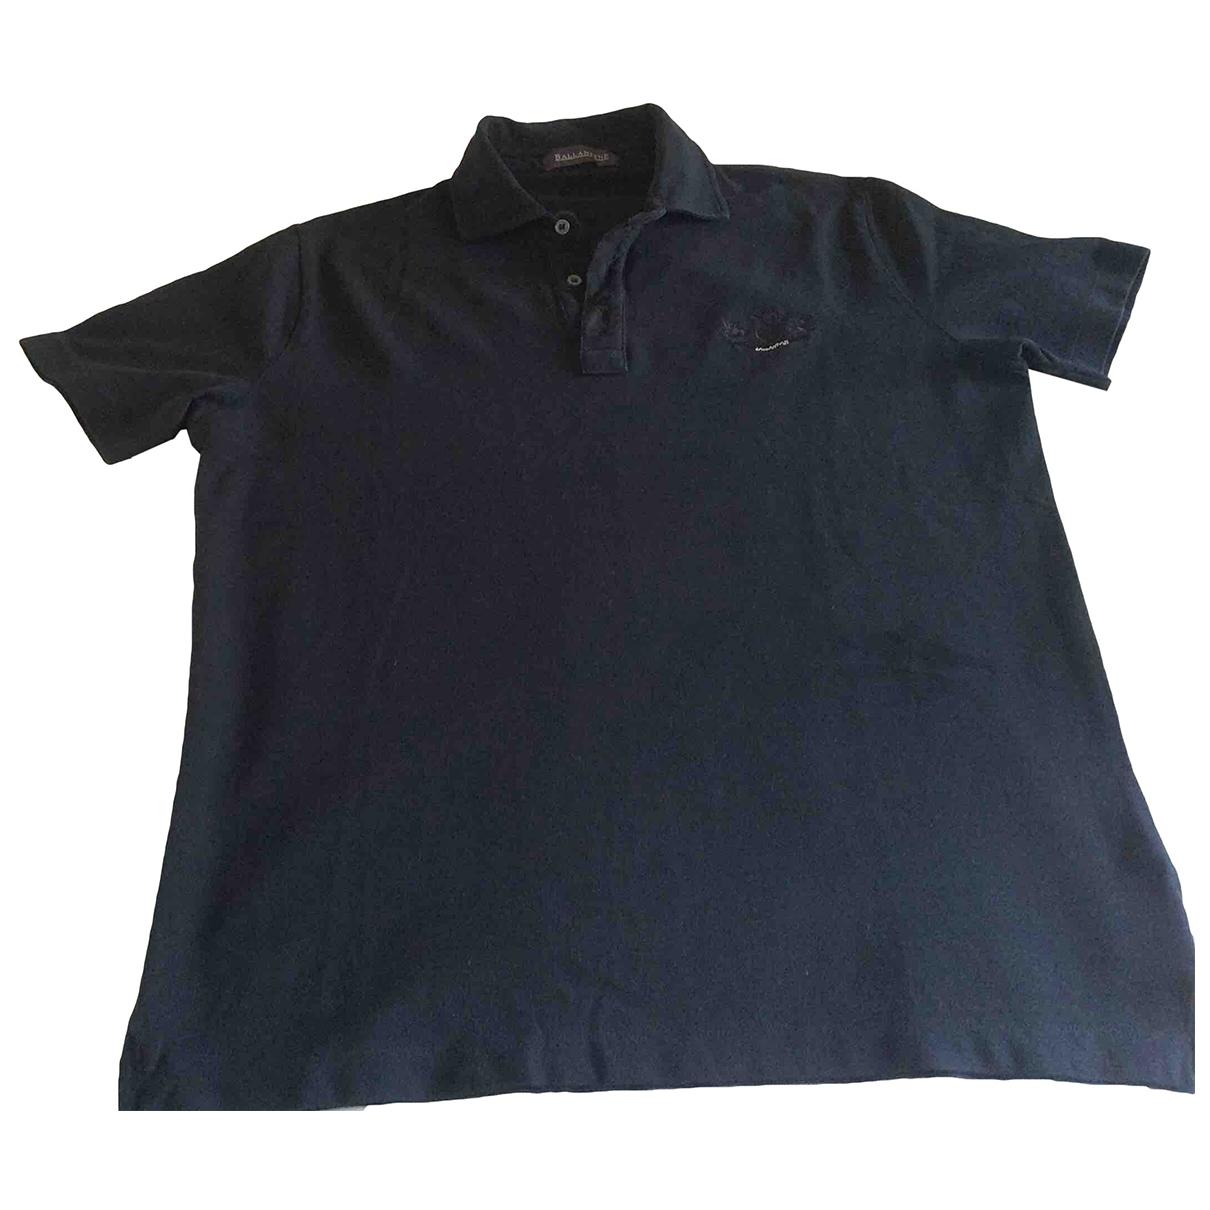 Ballantyne \N Poloshirts in  Schwarz Baumwolle